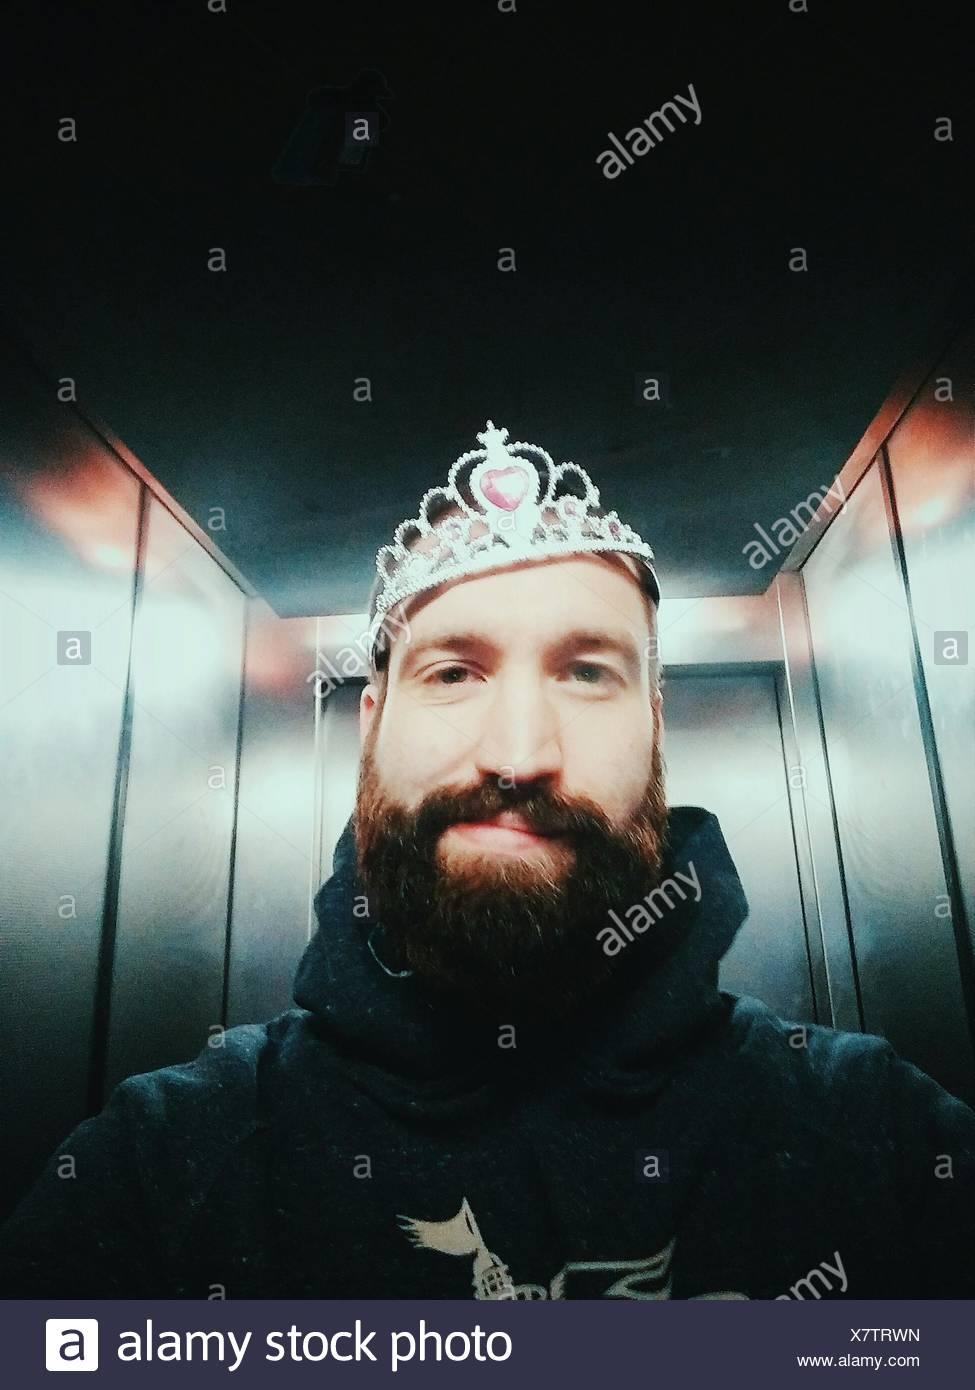 Retrato del hombre que llevaba una corona de Ascensor Imagen De Stock